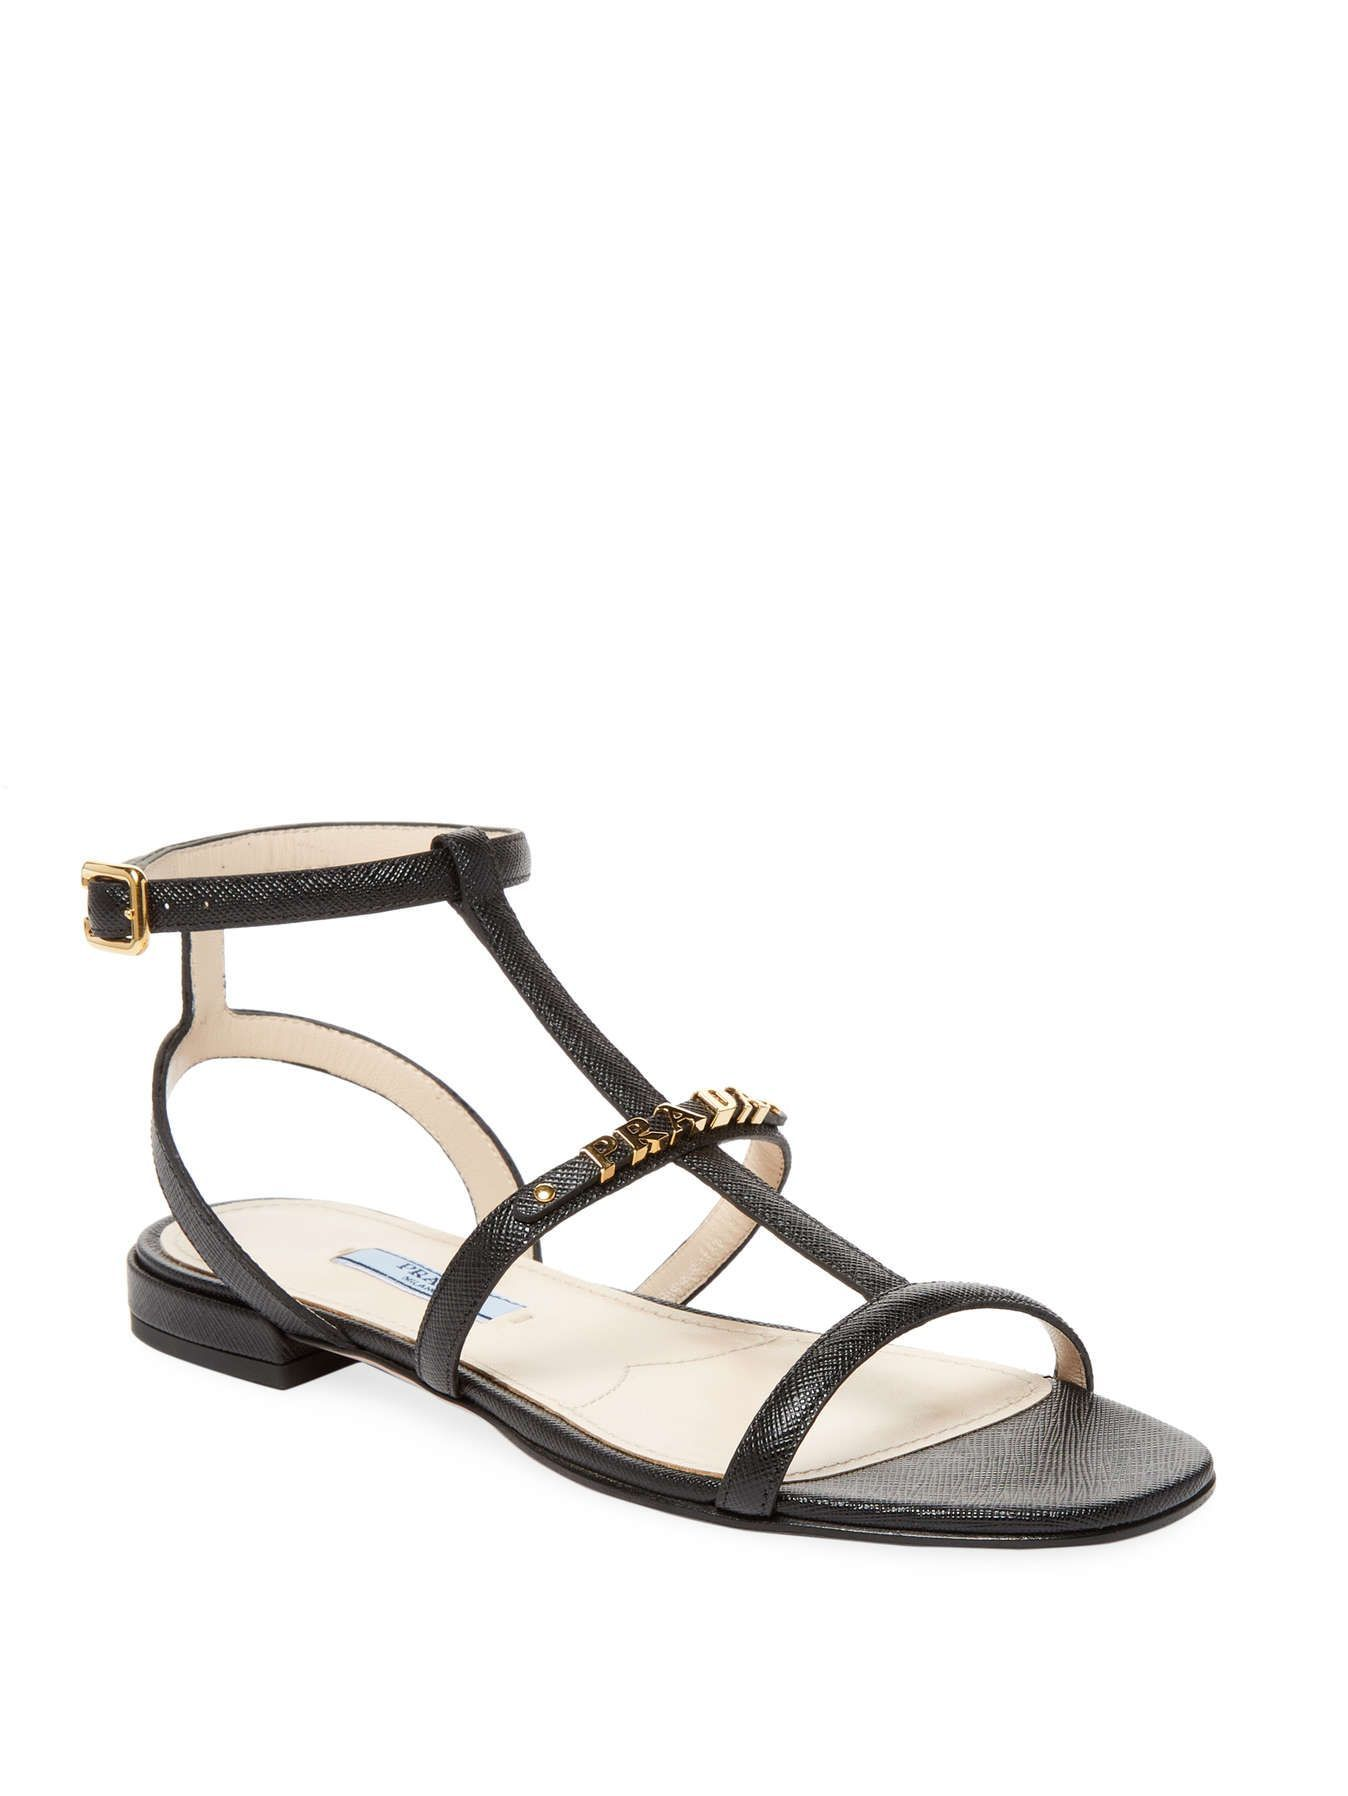 e8d7d206eb1 Prada Leather Low Heel Sandal Low heel sandal Leather upper Open toe  Cut-out details